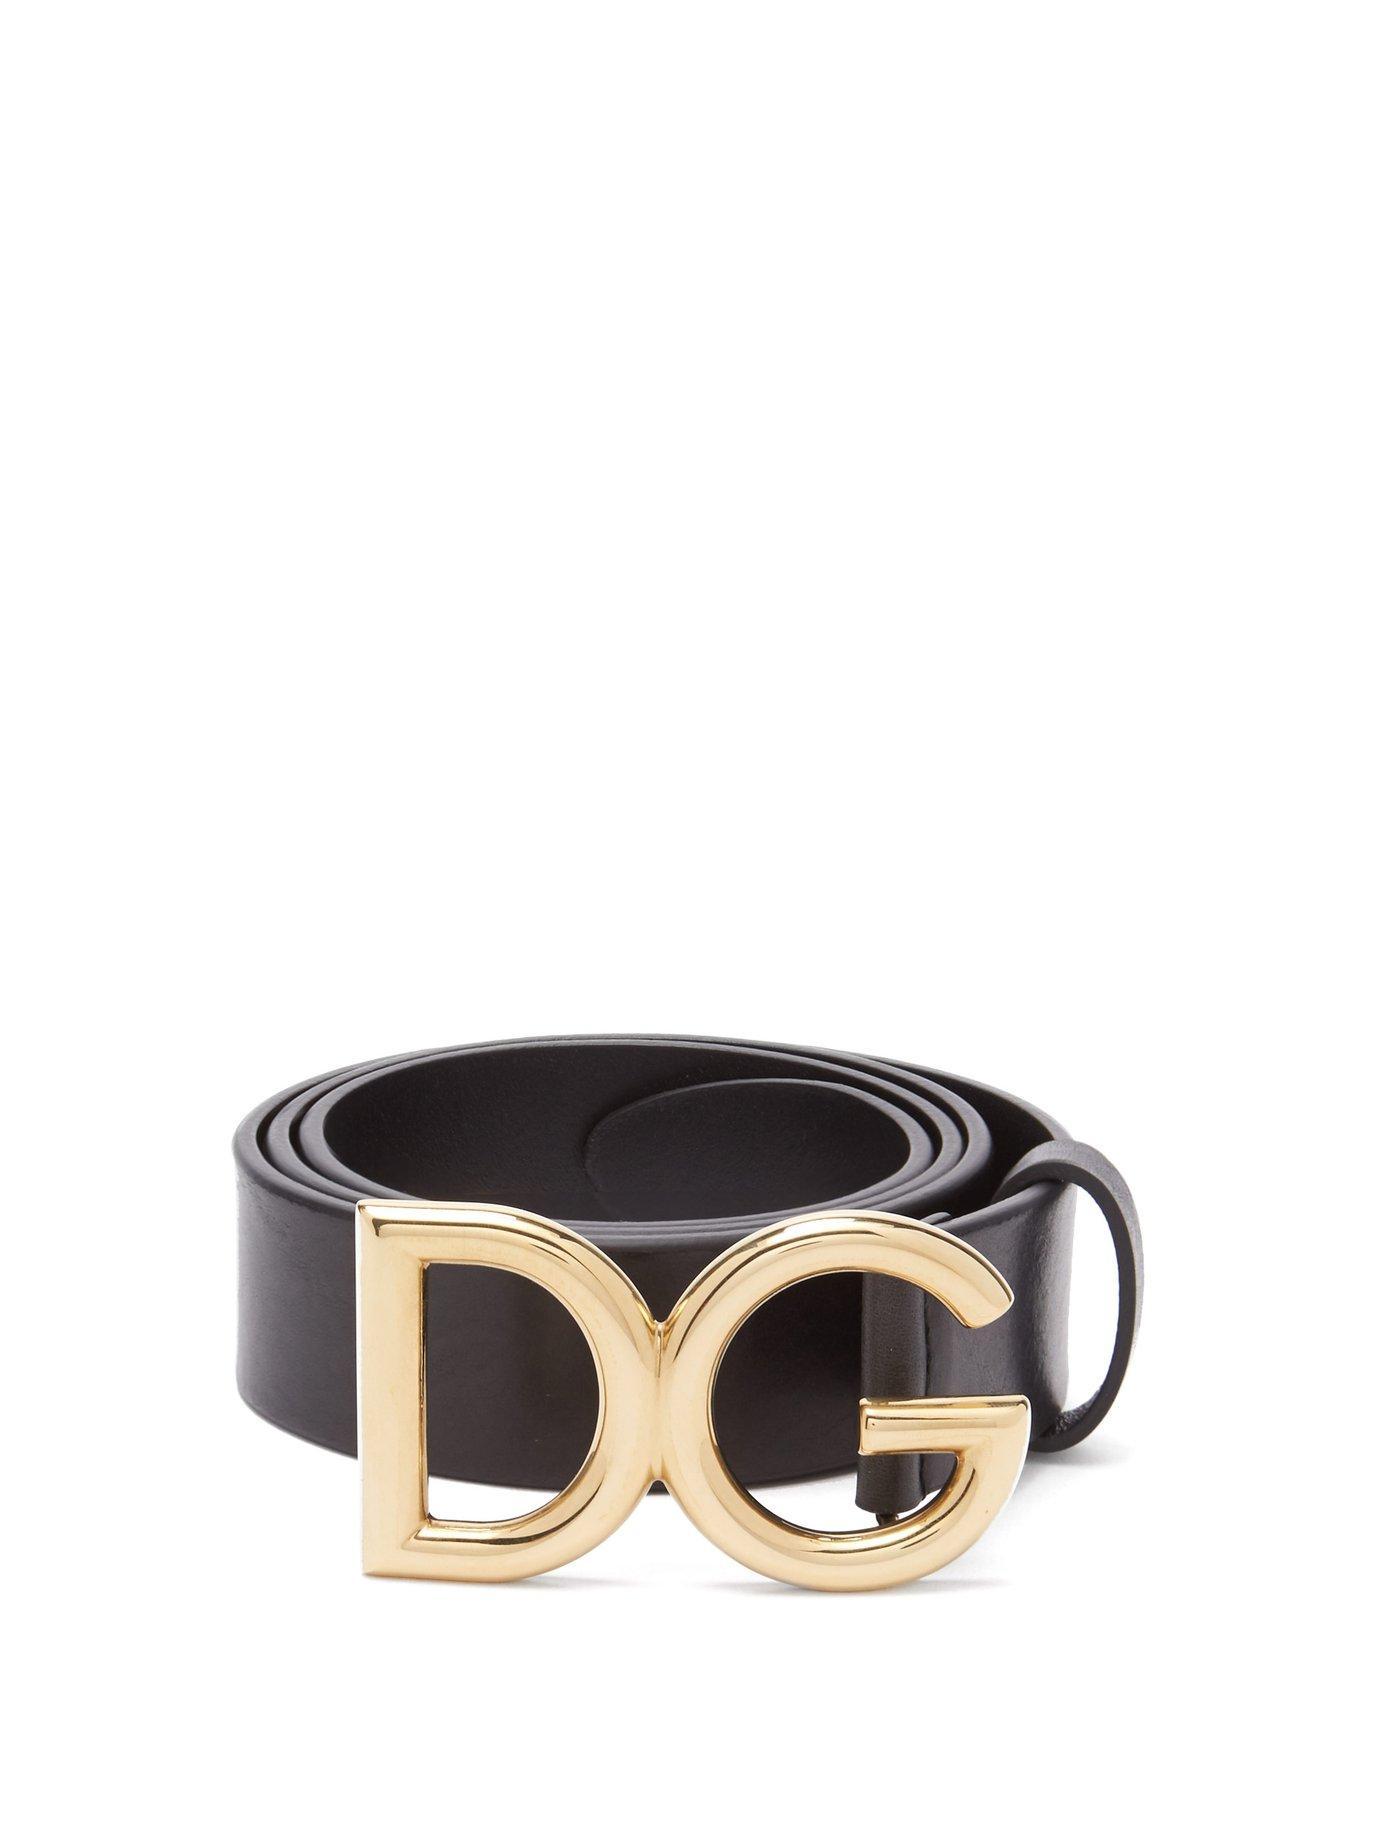 Lyst - Dolce   Gabbana Dg Buckle Leather Belt in Black for Men 3855b6078c7eb